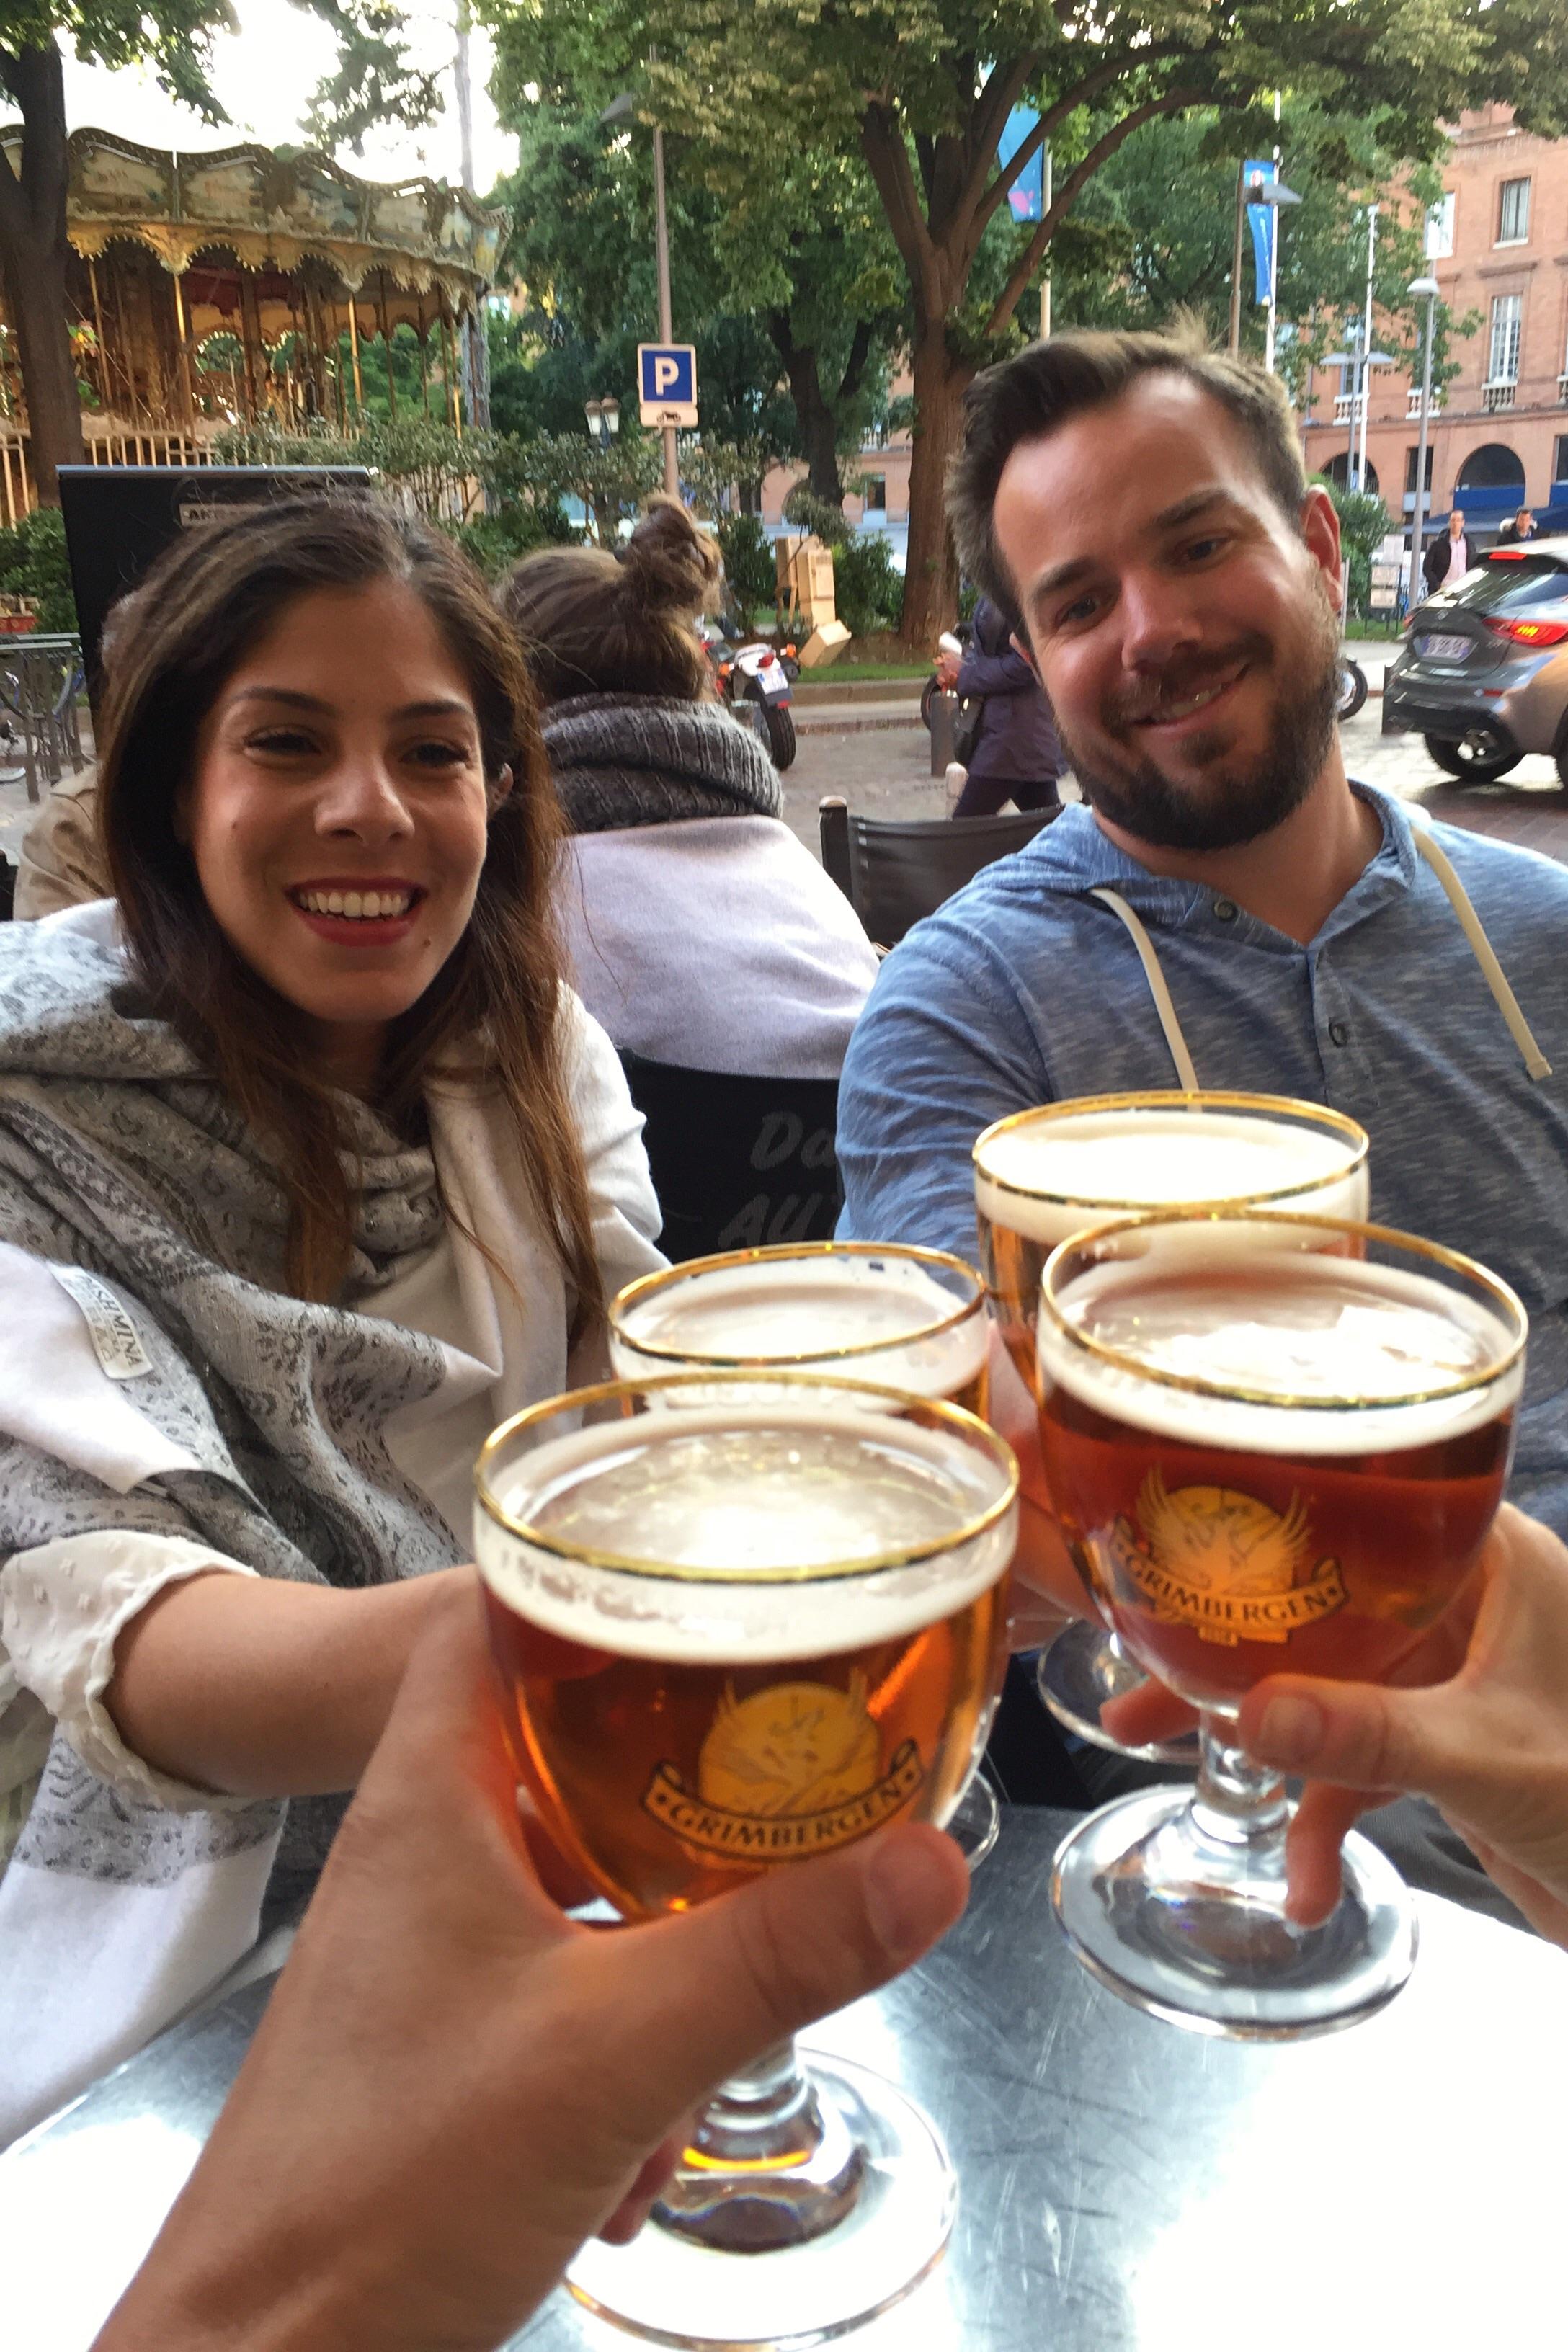 Toulouse honeymooners...Chris & Alia. Congrats!